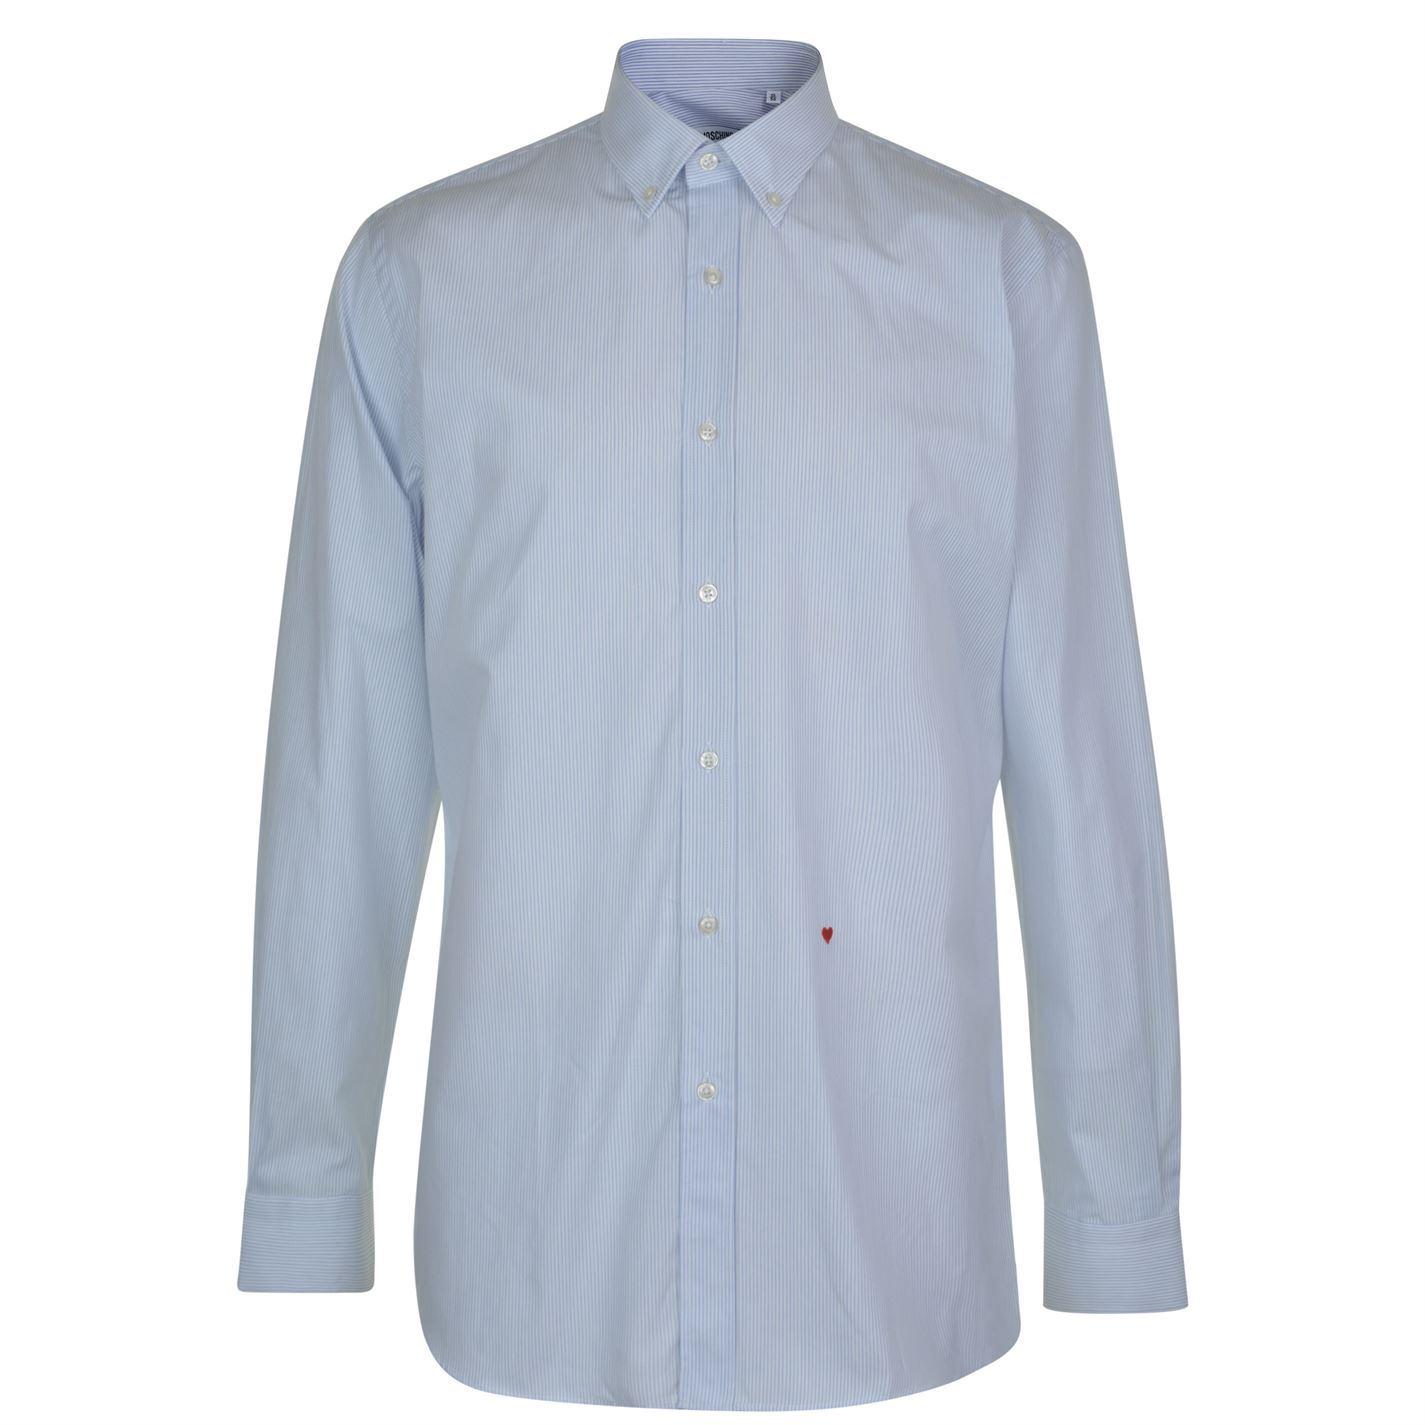 Moschino Mens Shirt Formal Button Up Long Sleeve Cotton